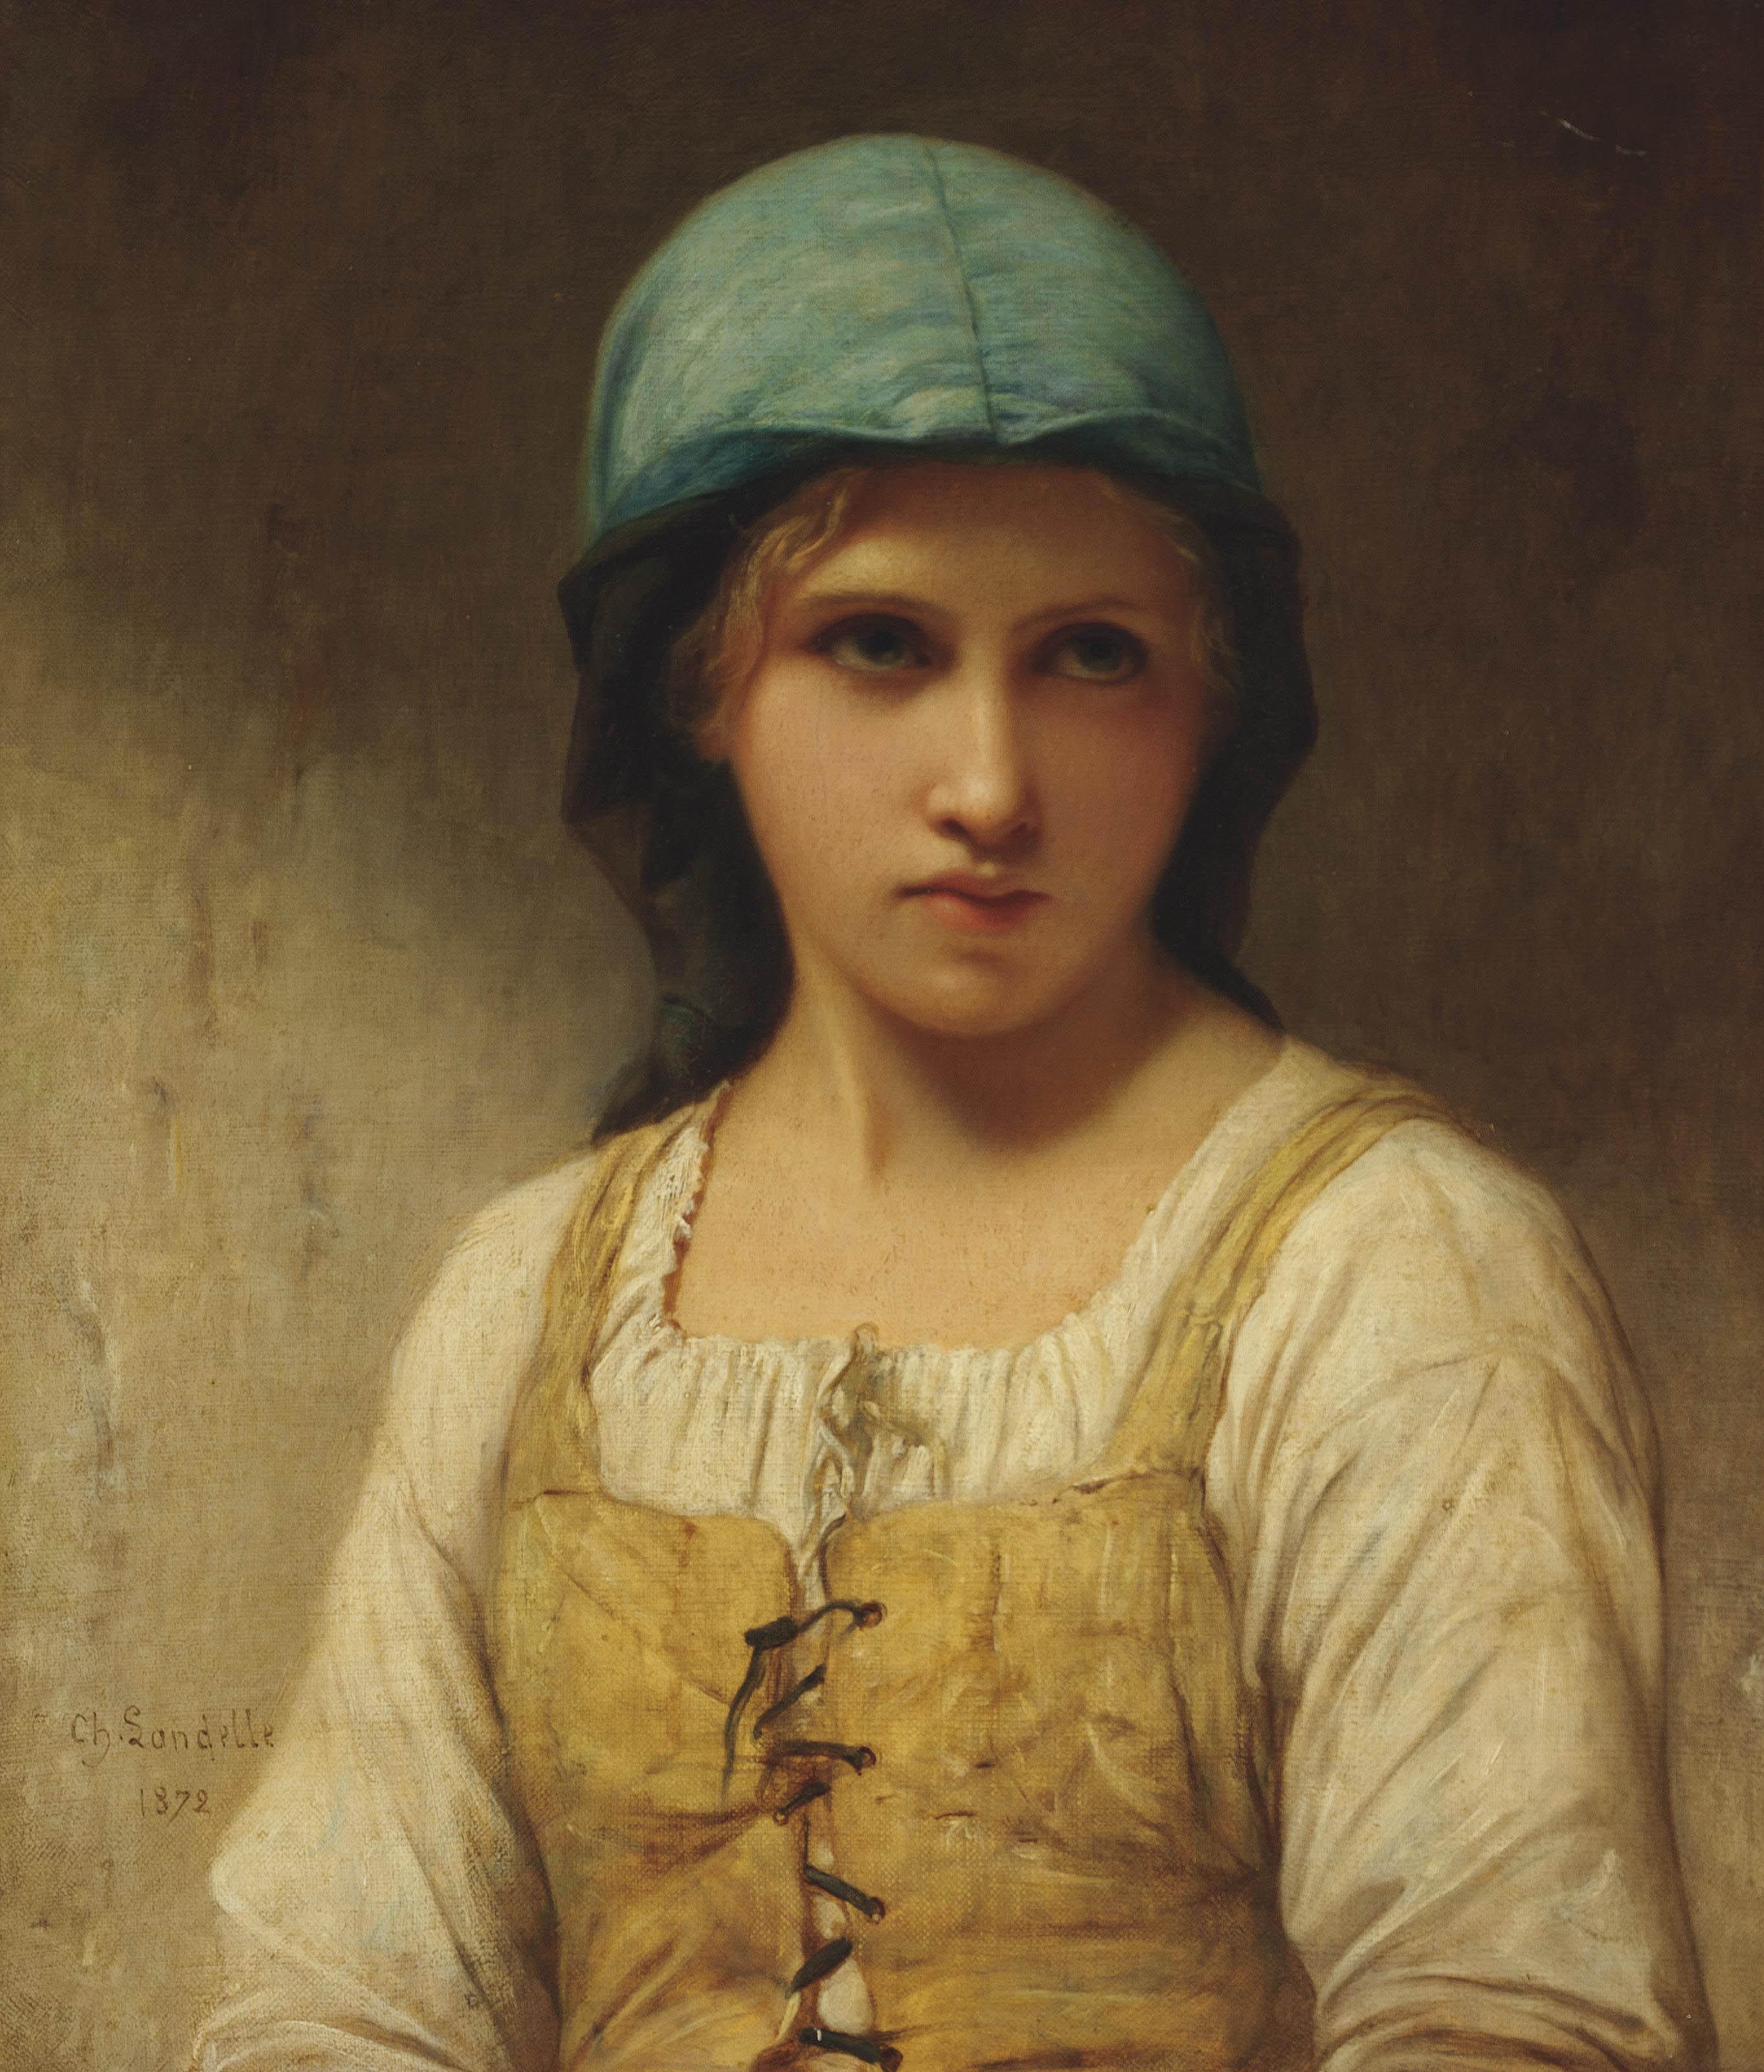 La jeune paysanne